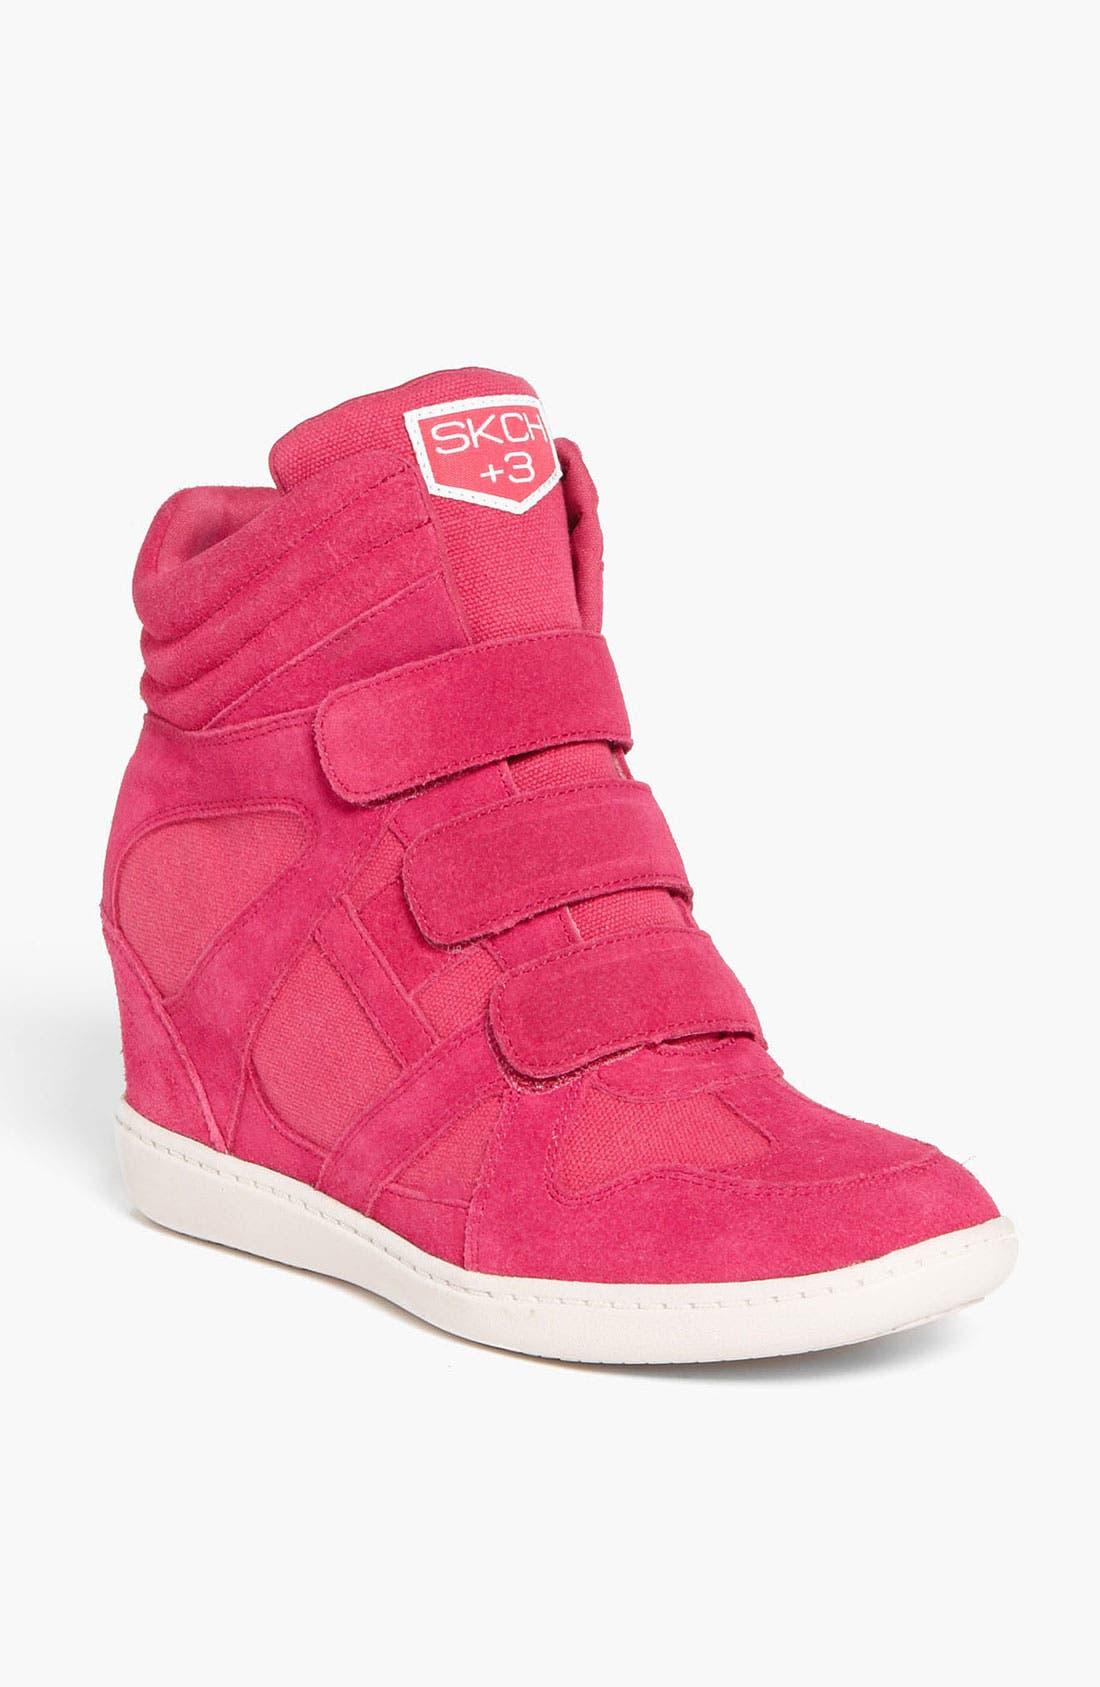 Alternate Image 1 Selected - SKECHERS 'Plus 3 Raise the Bar' Wedge Sneaker (Women)